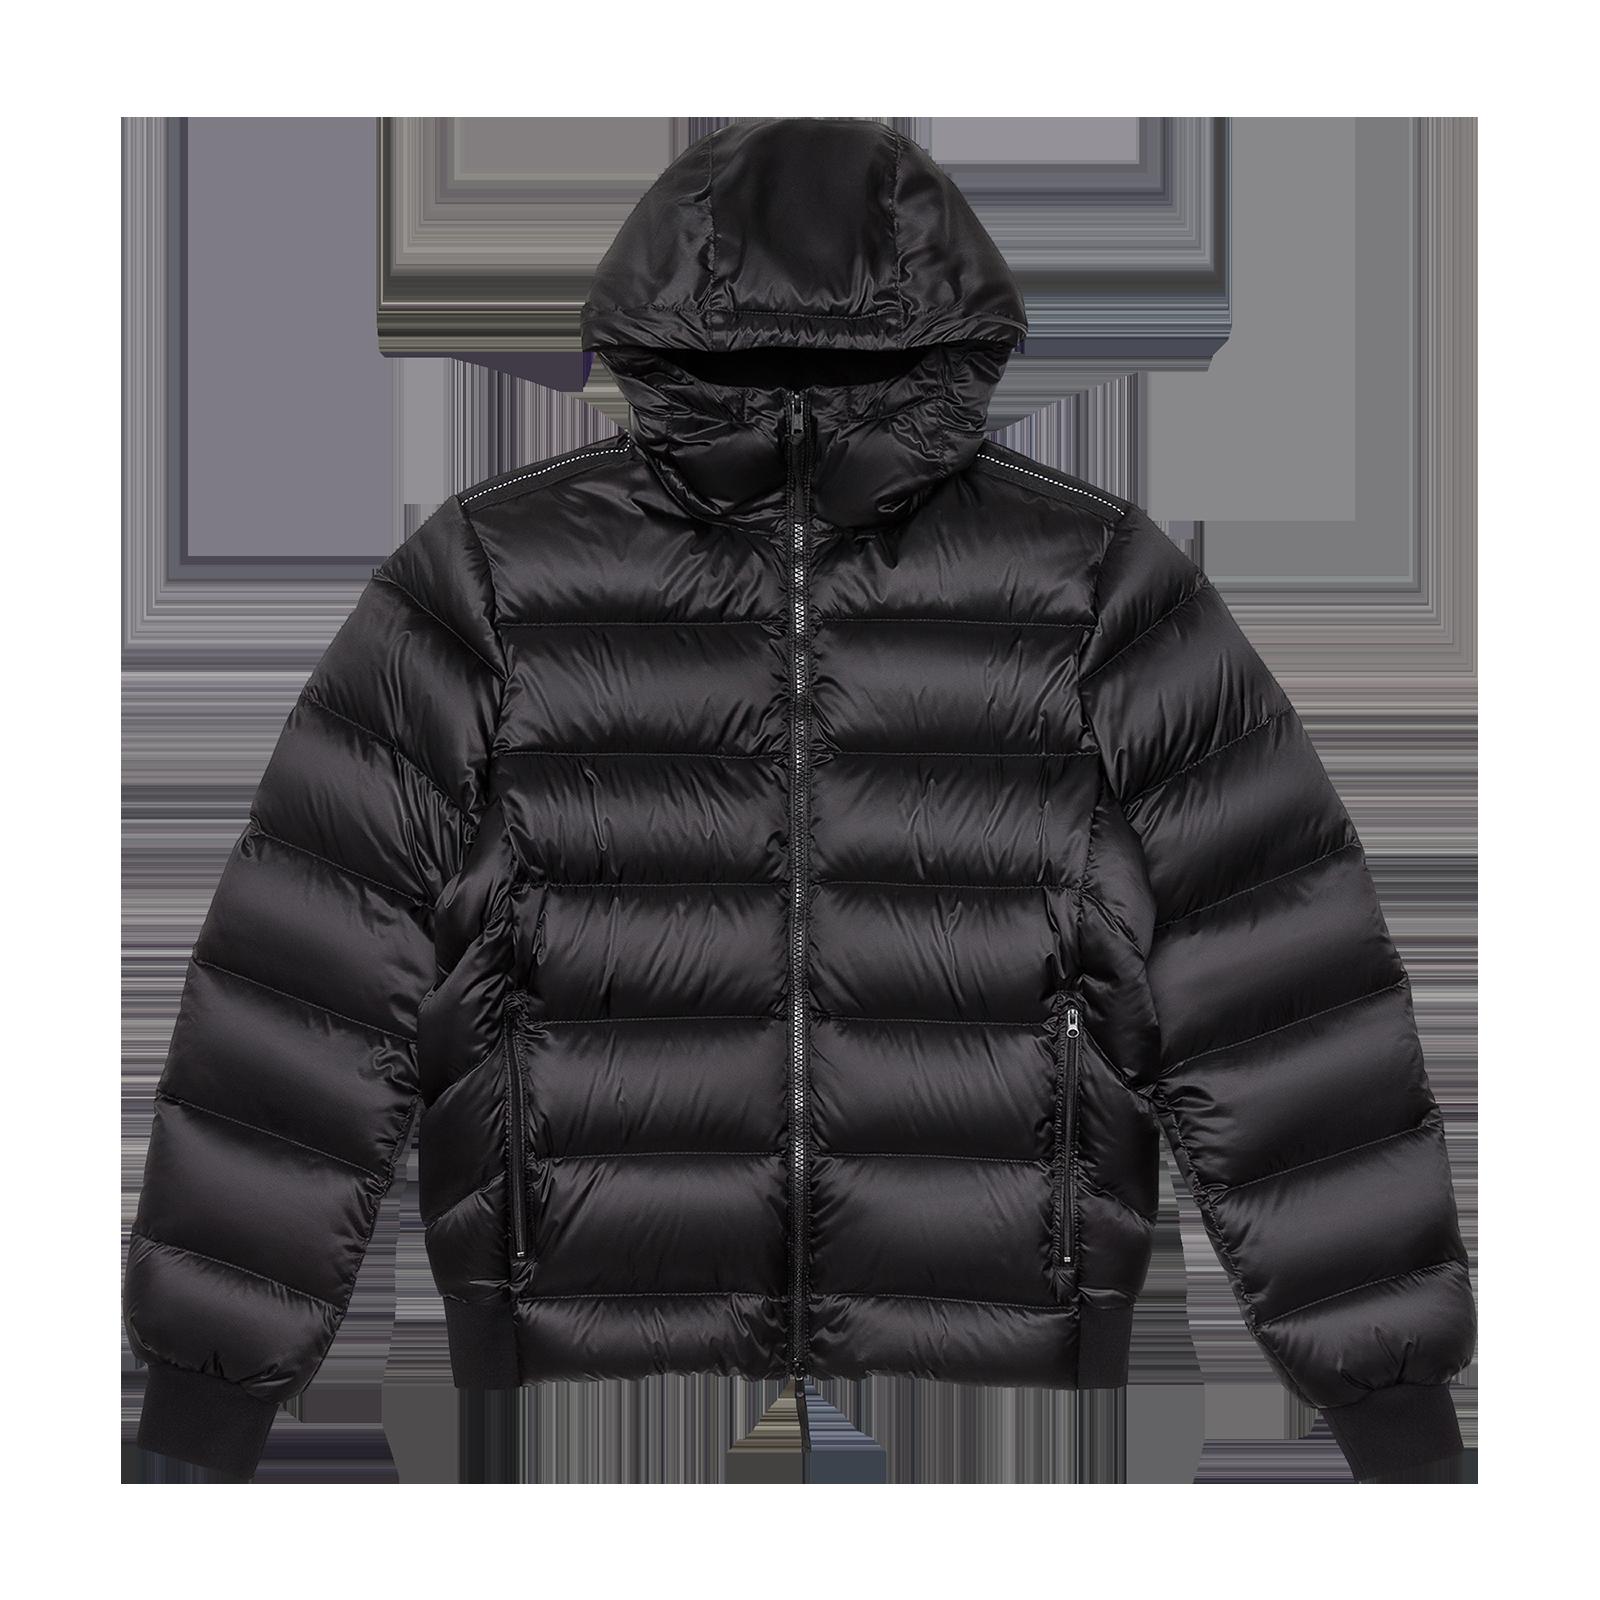 Puffer jacket product image